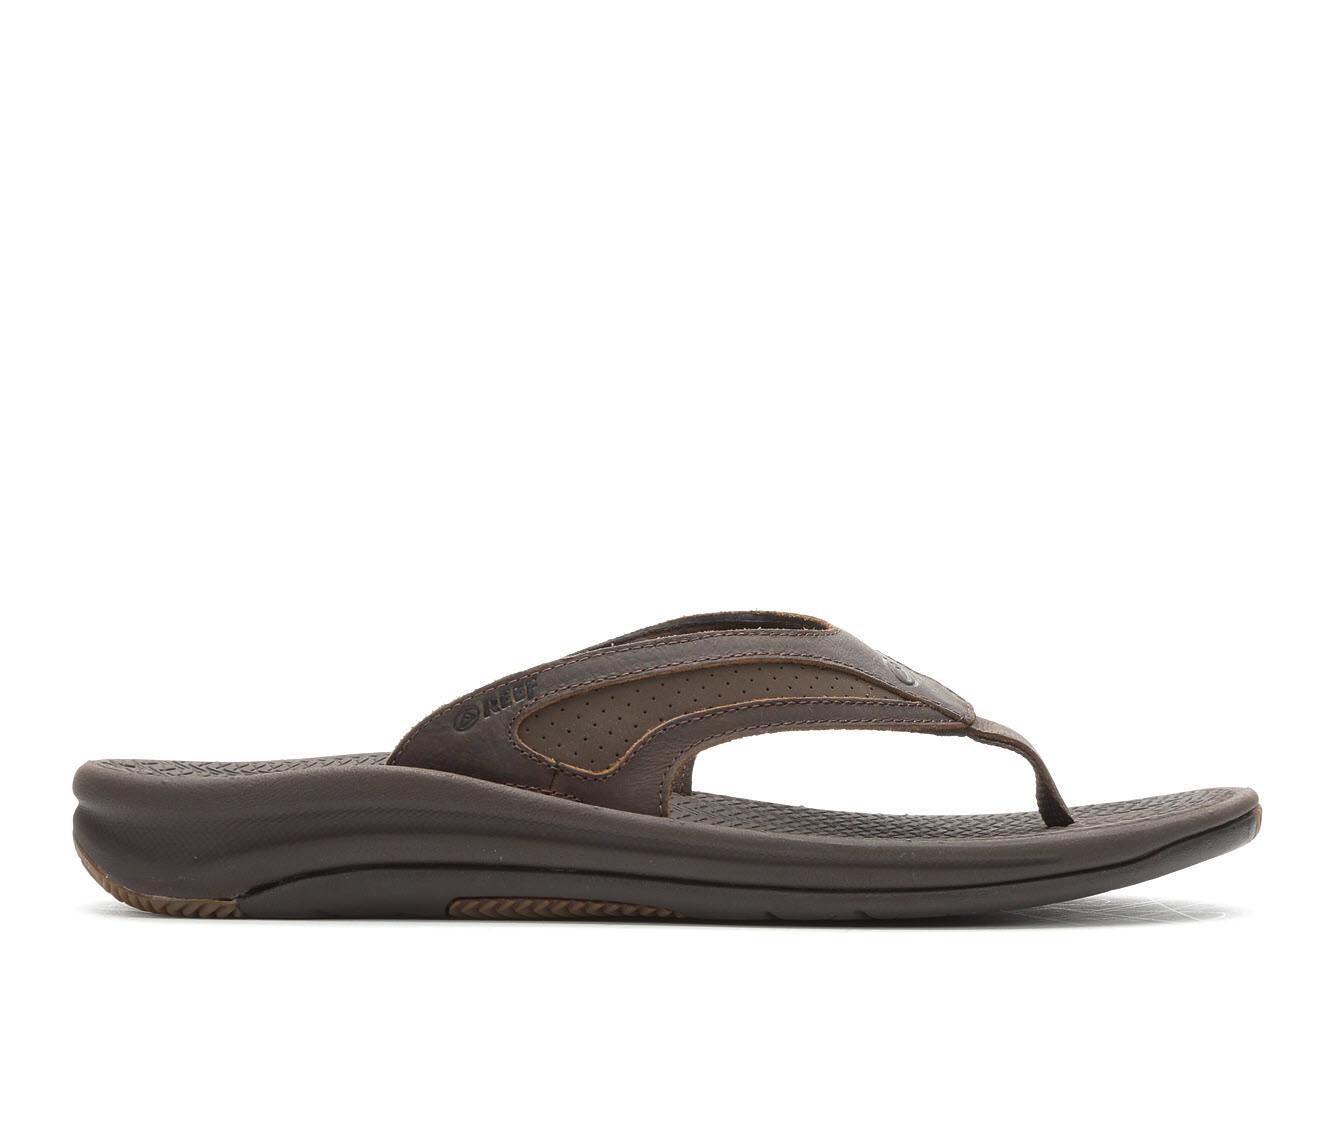 uk shoes_kd1060